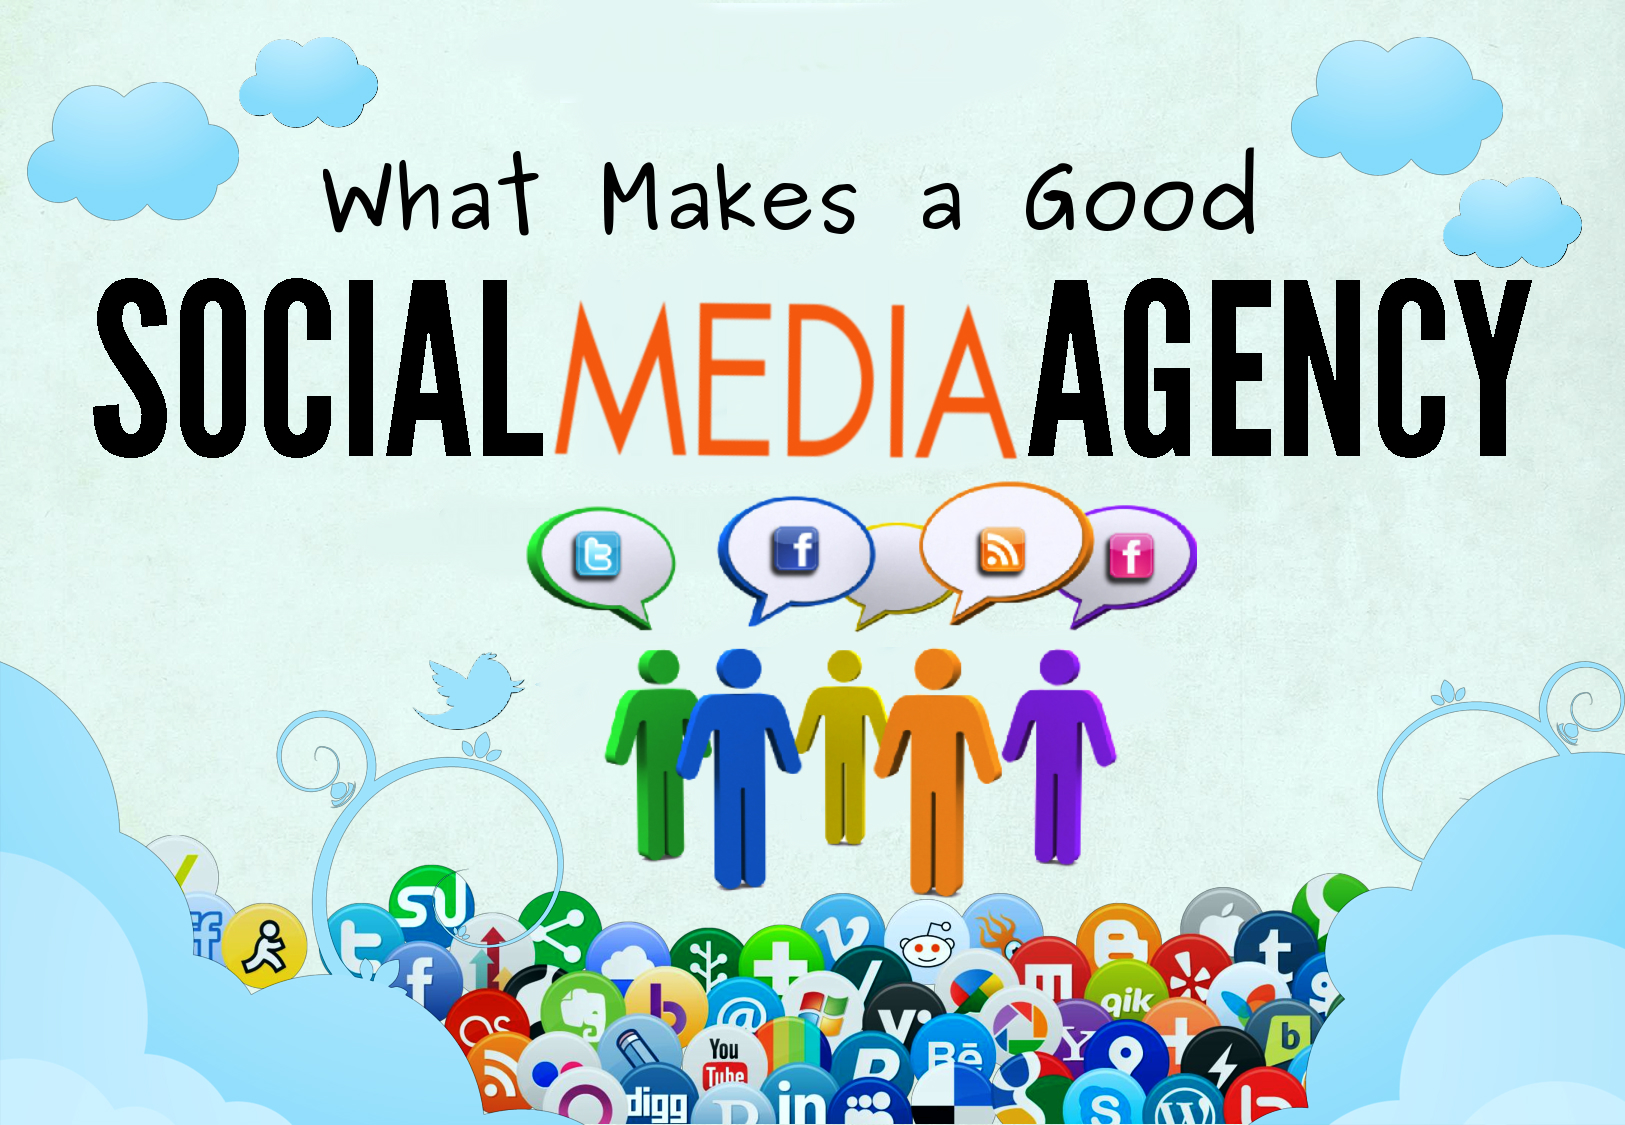 Social Media Agency HD For Wallpapers 3948 Wallpaper ForWallpapers 1625x1125